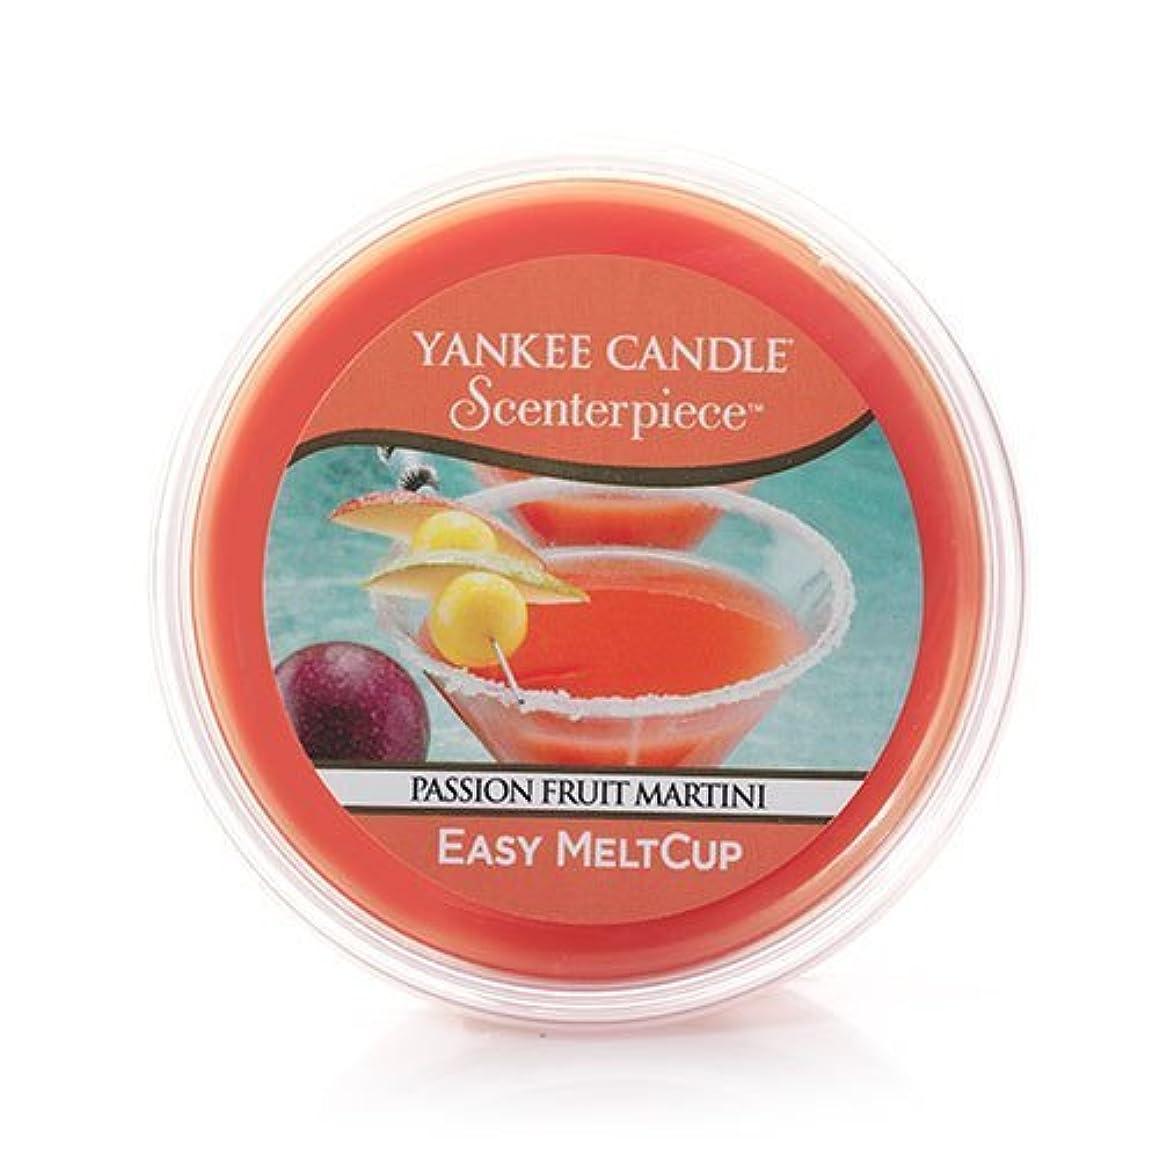 Yankee CandleパッションフルーツMartini Scenterpiece Easy MeltCup 2.2 Oz